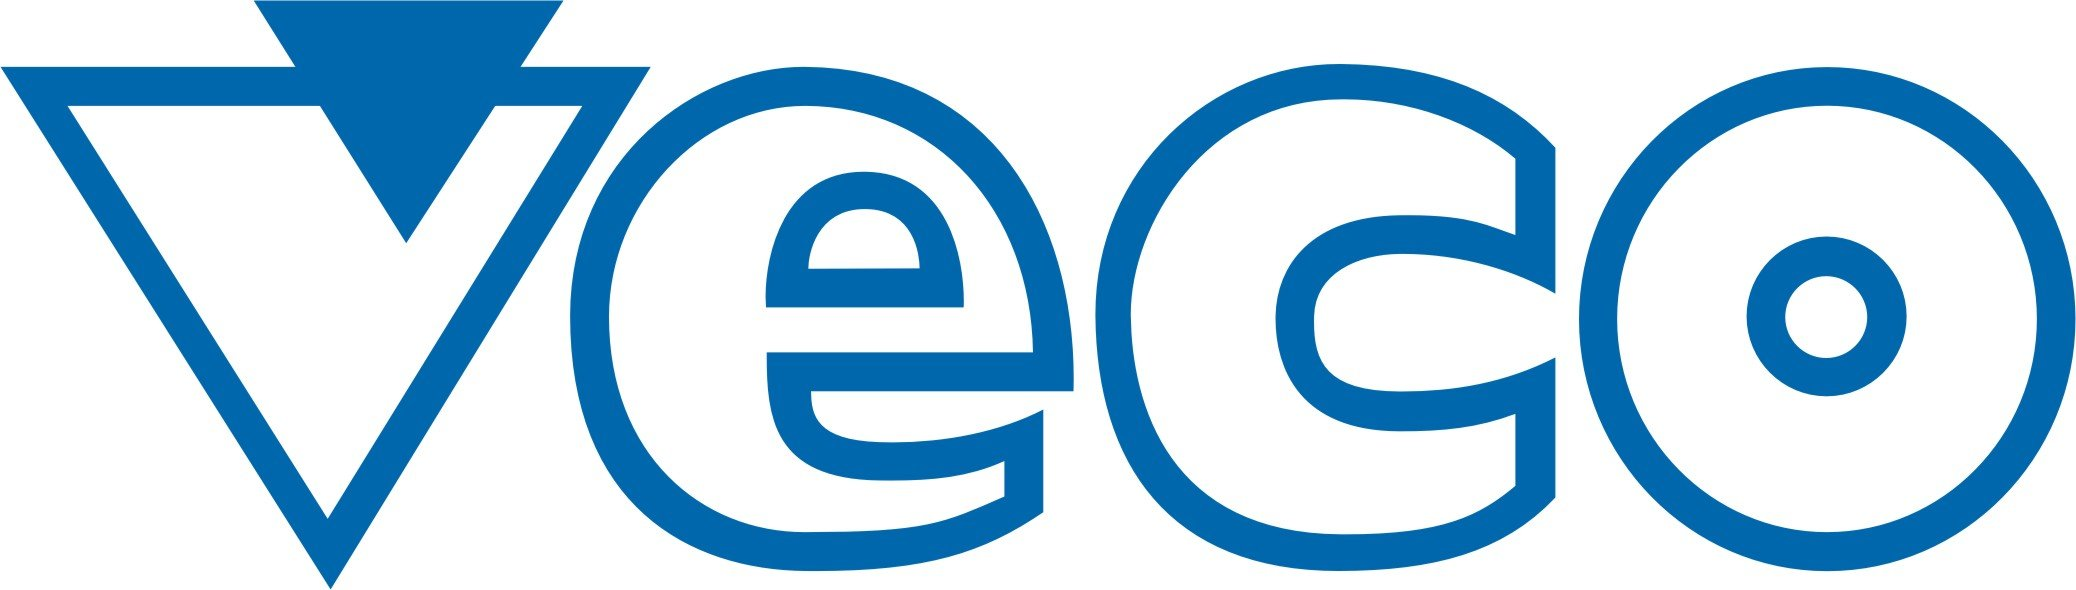 veco-logo